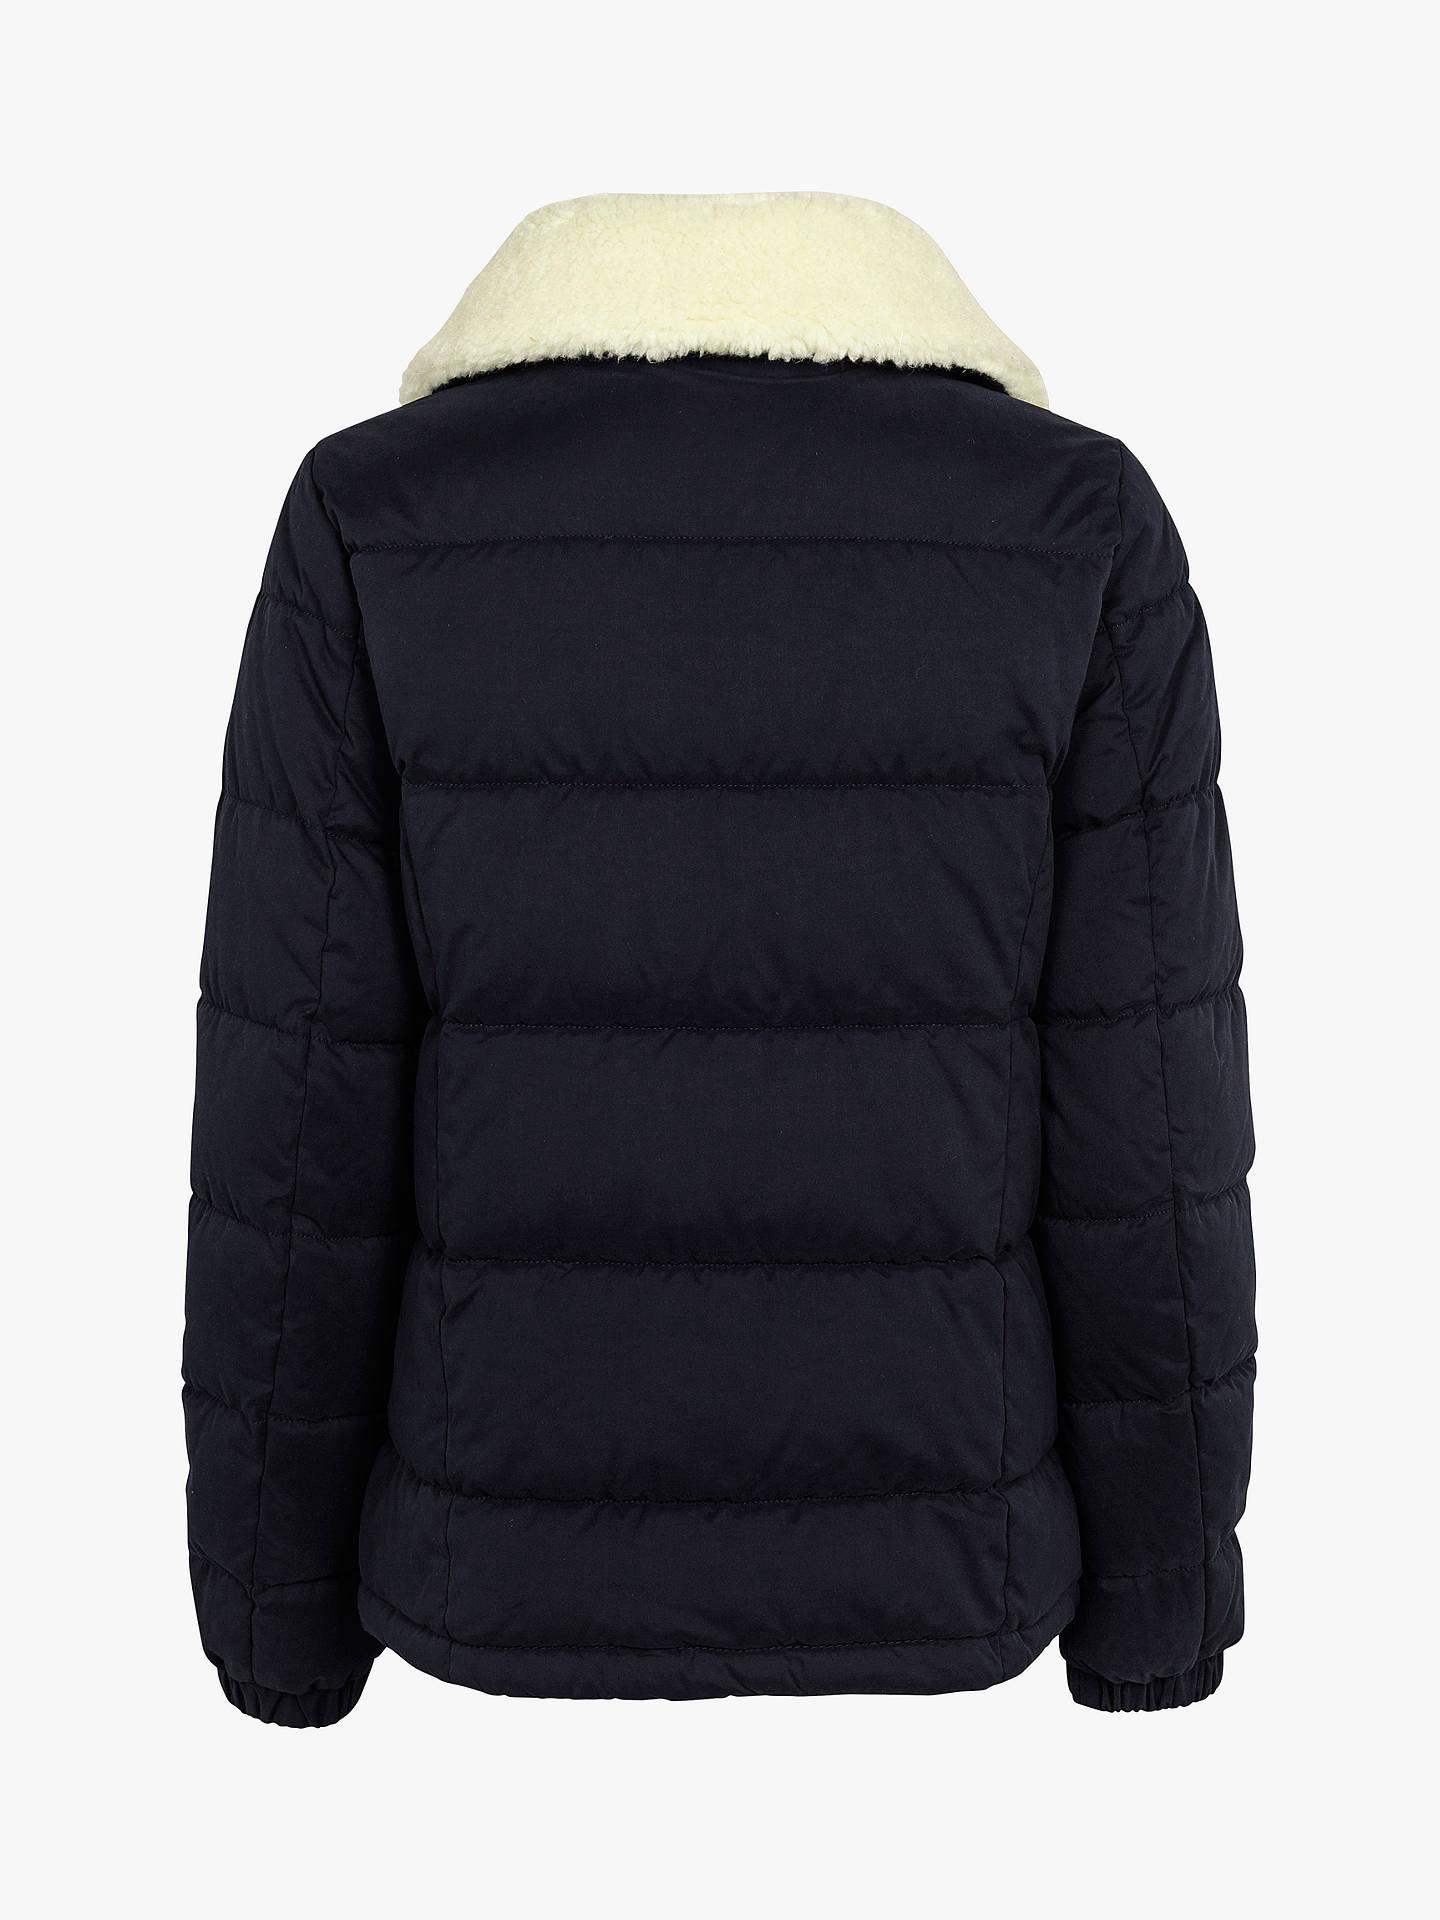 Fat Face Poppy Puffer Jacket, Technical